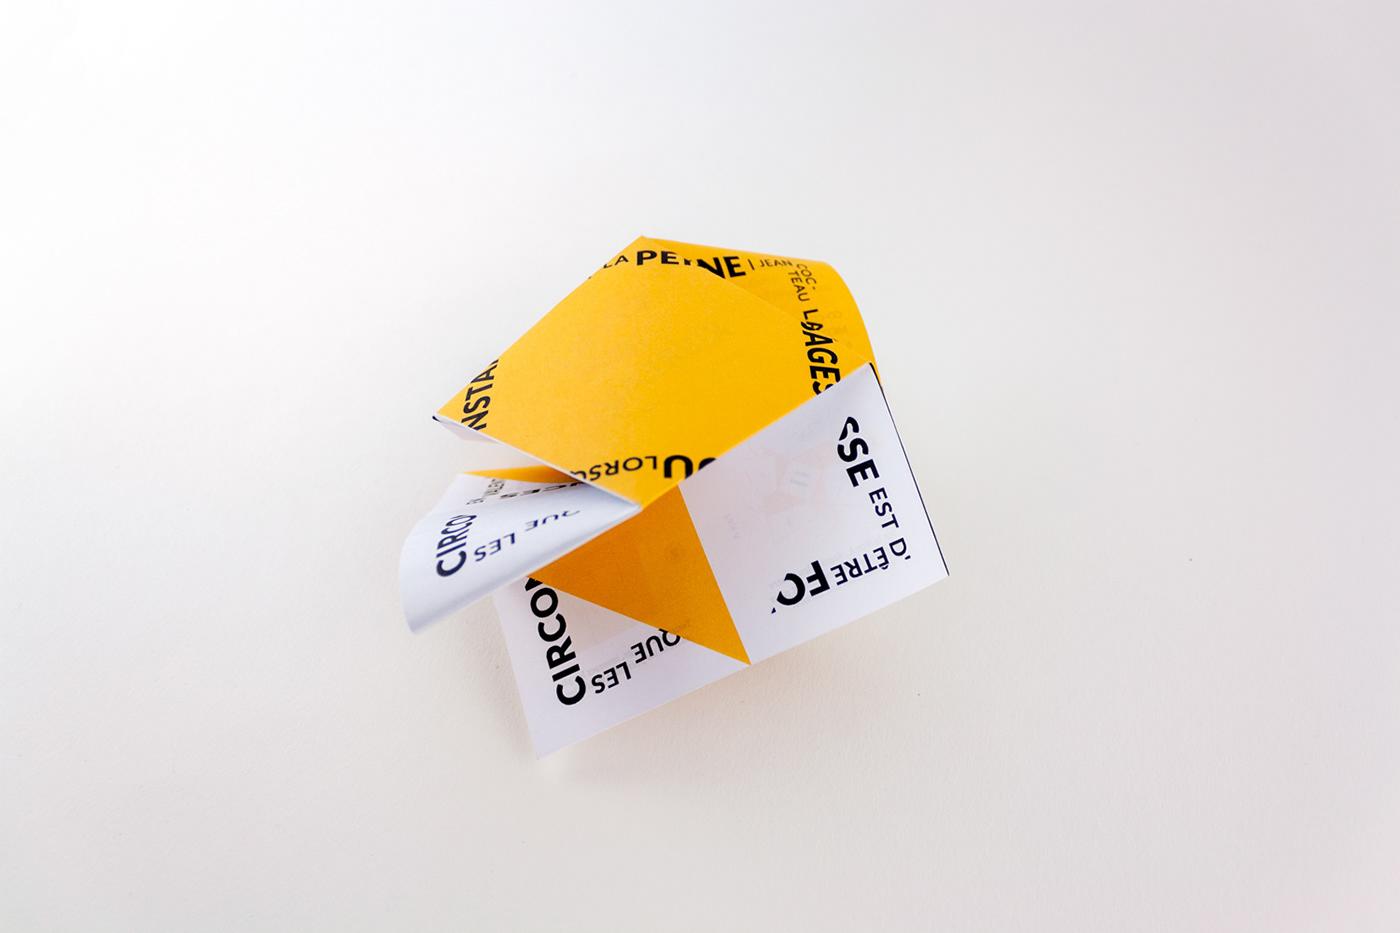 identité motifs tampons origami  tangram pliage